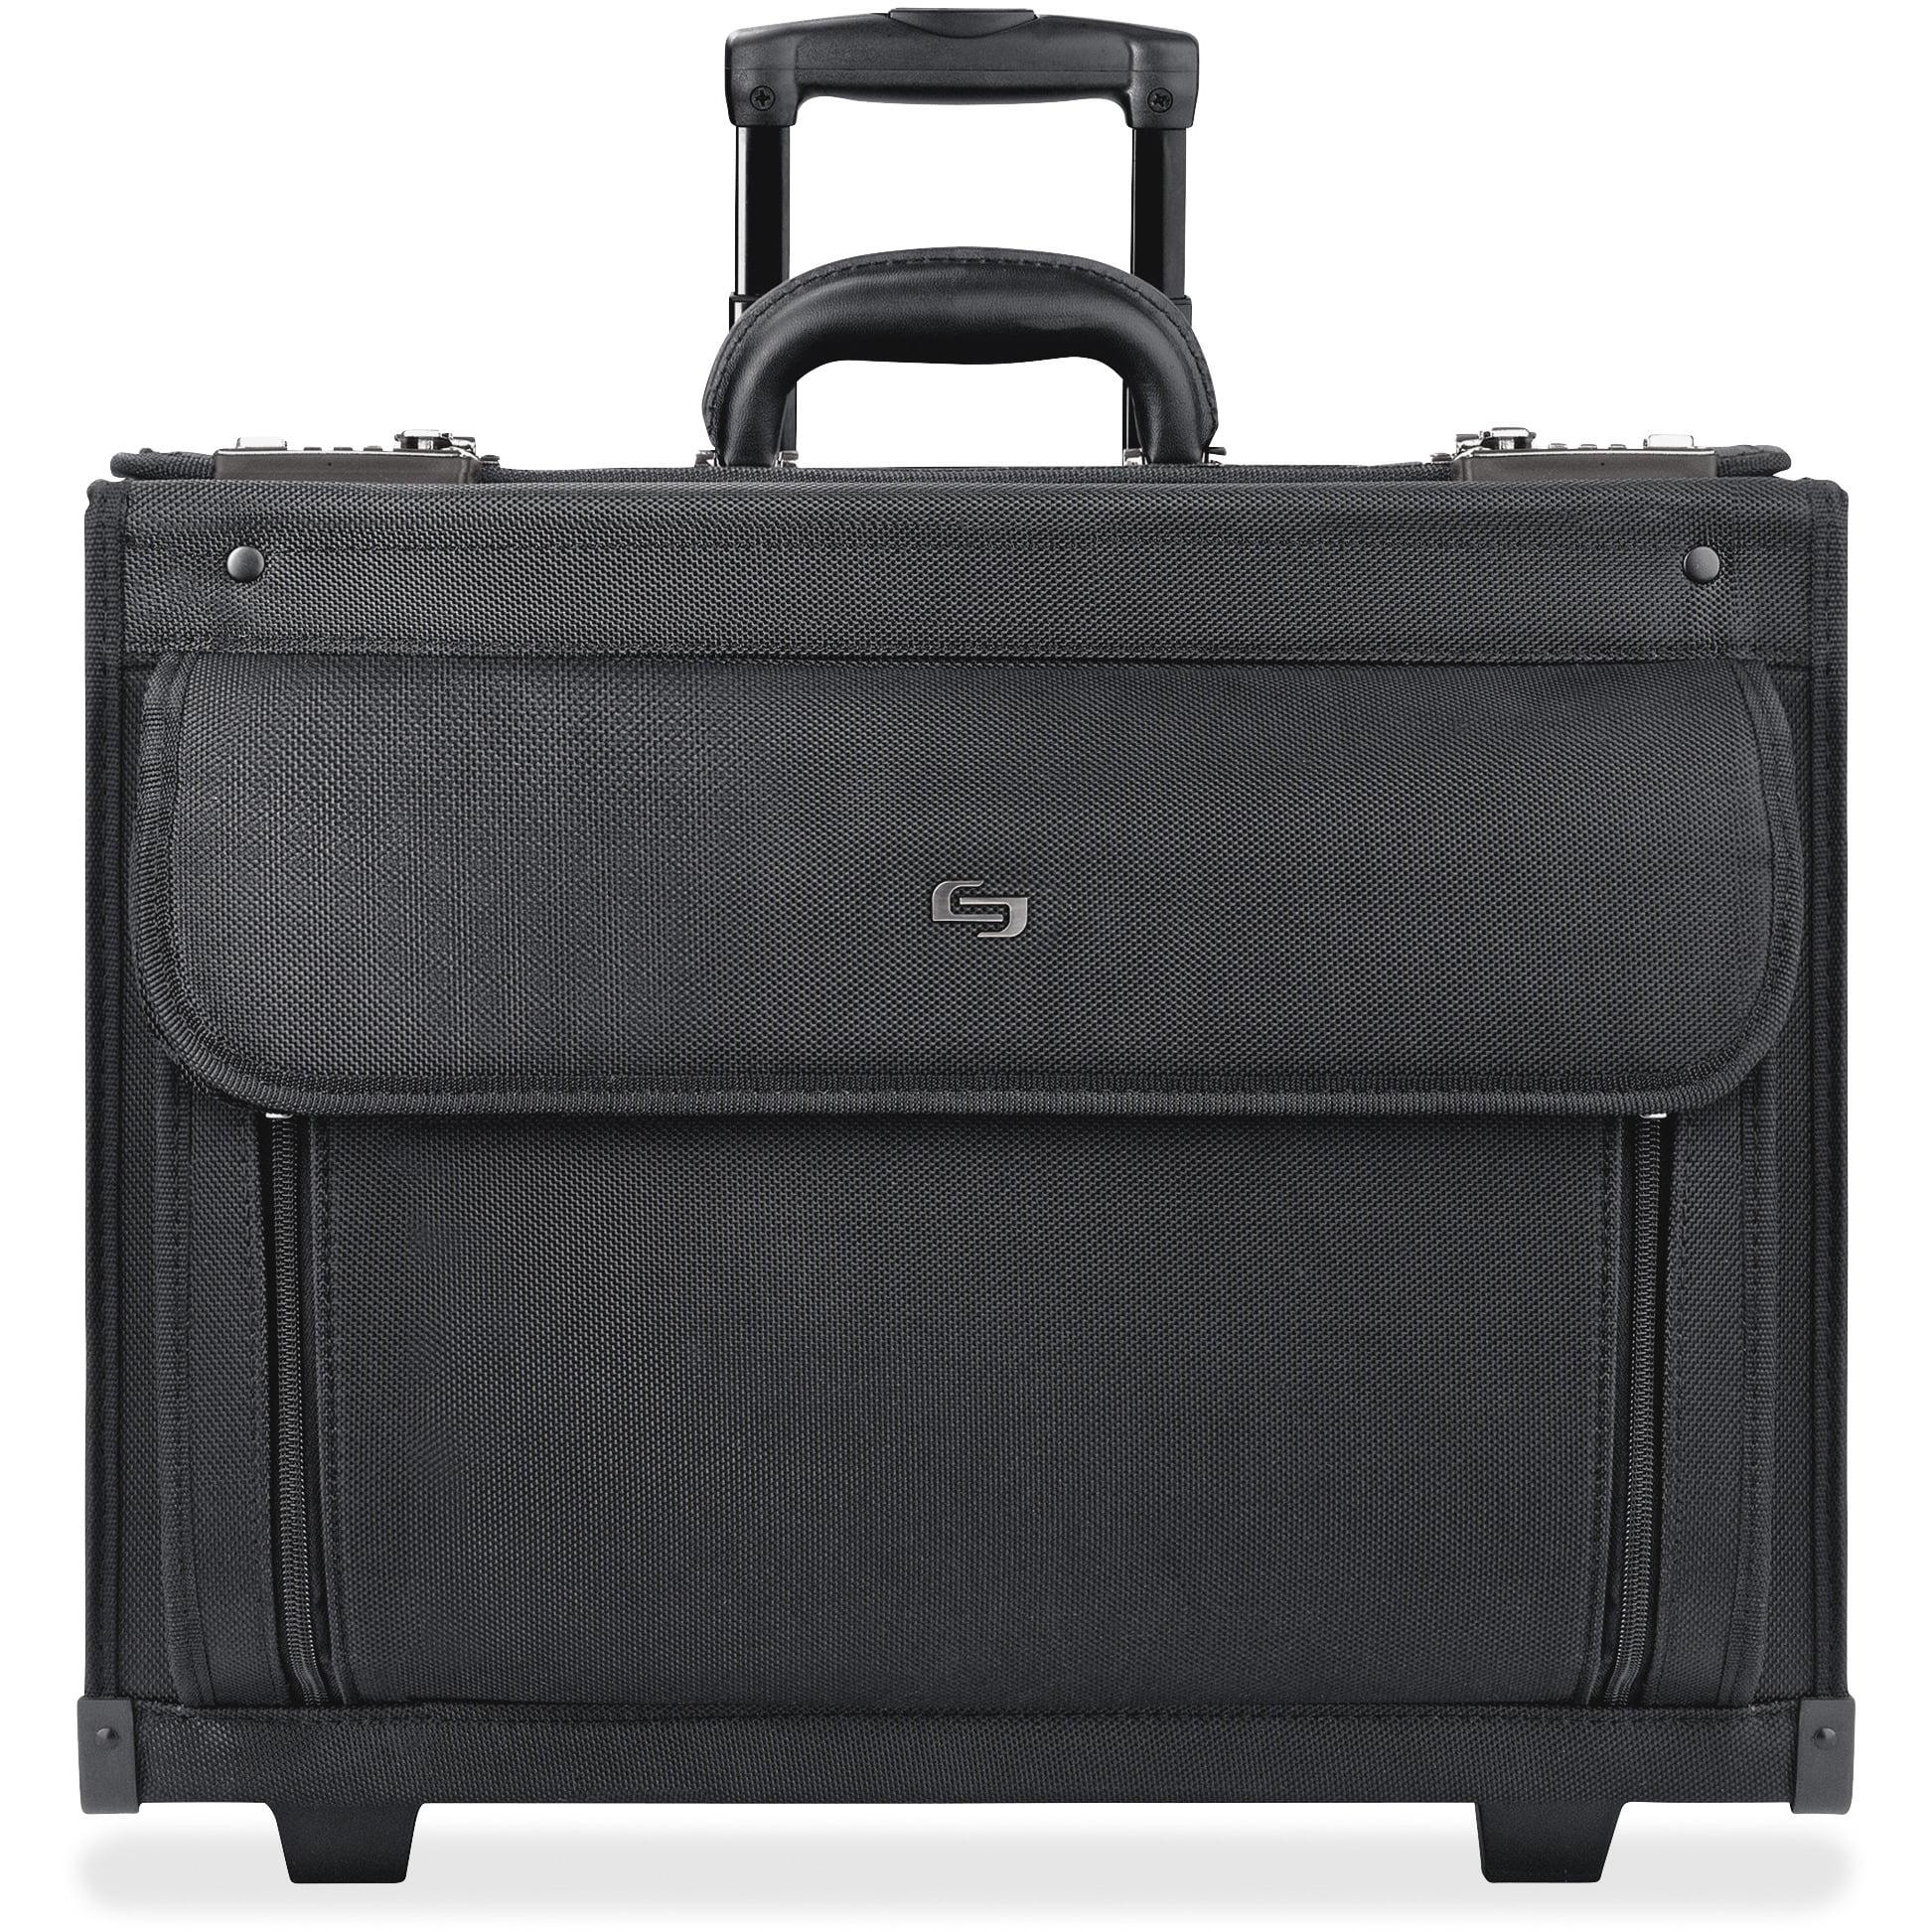 Solo, USLB784, US Luggage Ballistic Rolling Computer Catalog Case, 1, Black